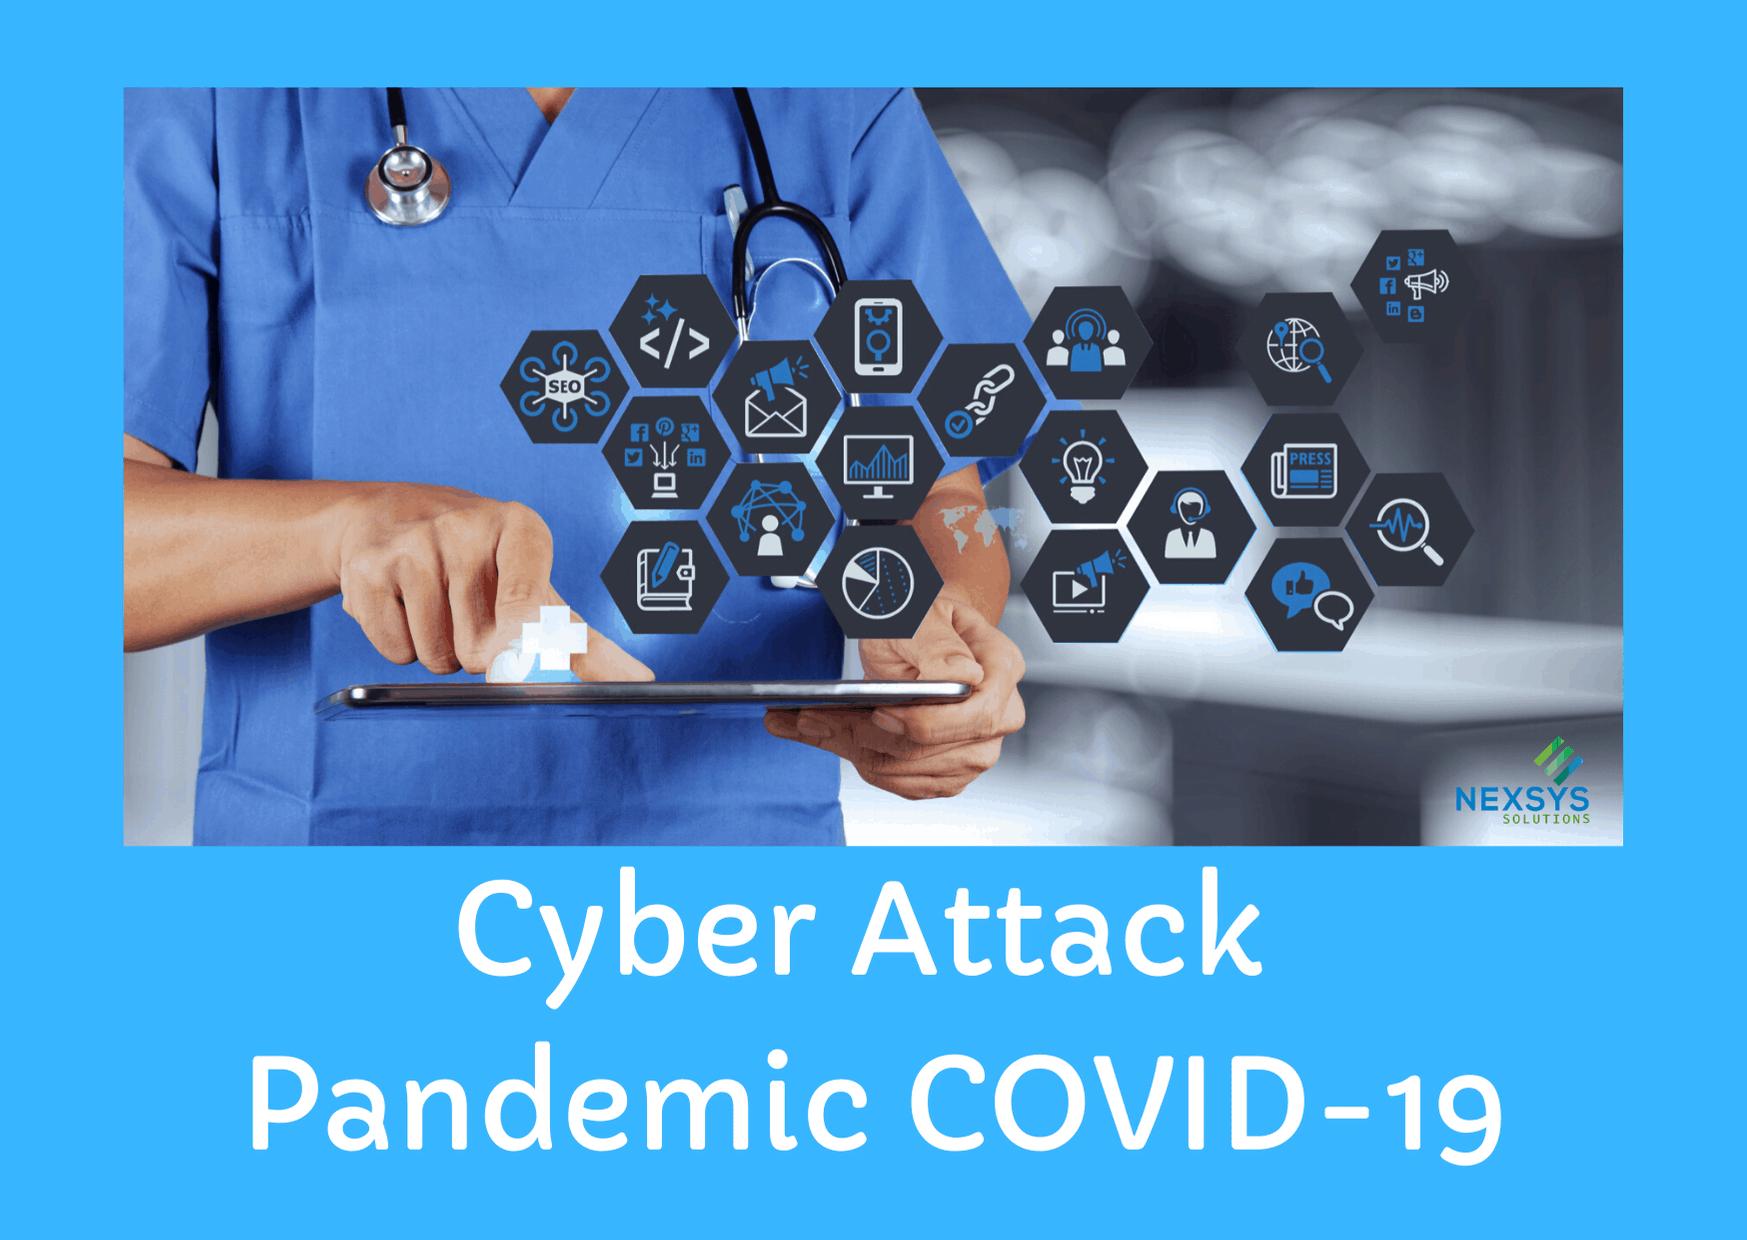 Attacco hacker alle strutture sanitarie